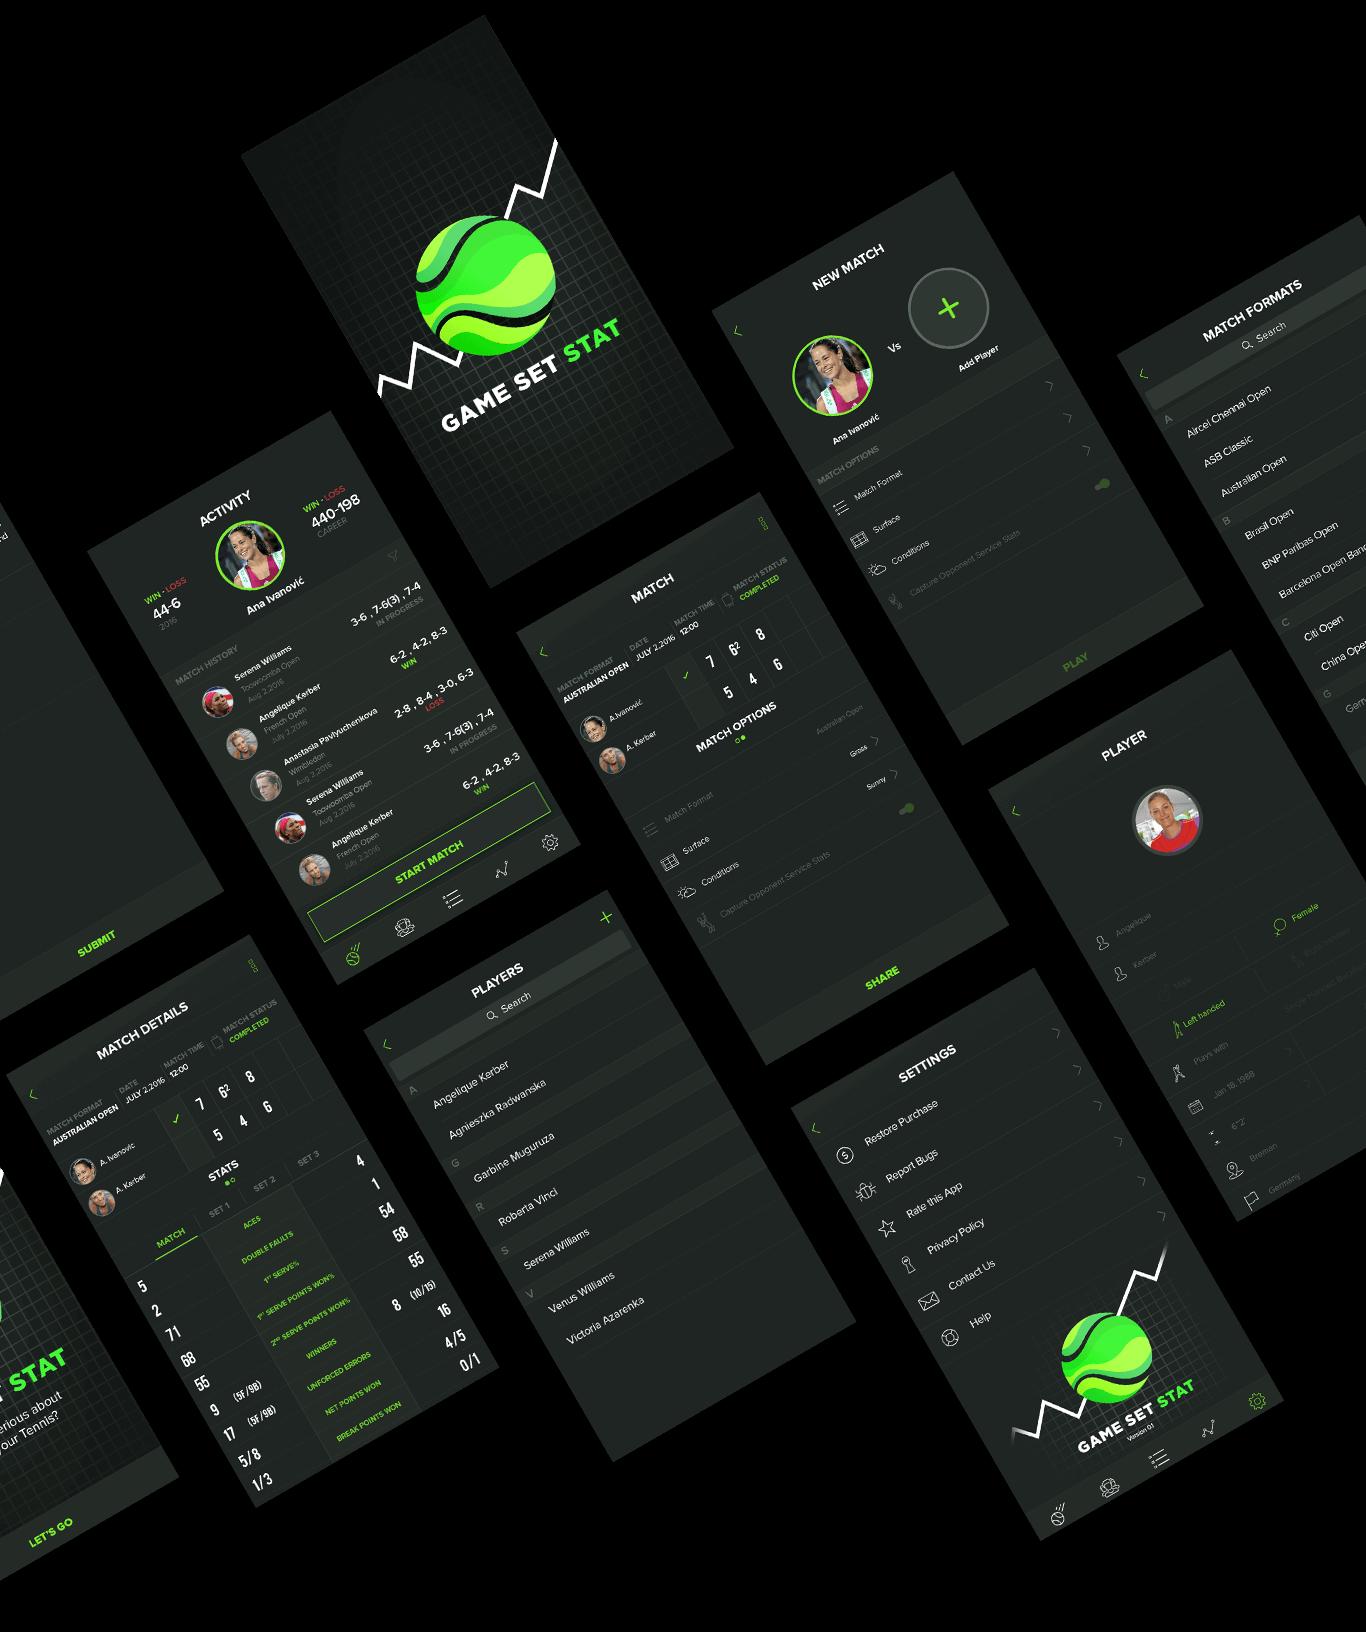 Game Set Stat app final interface